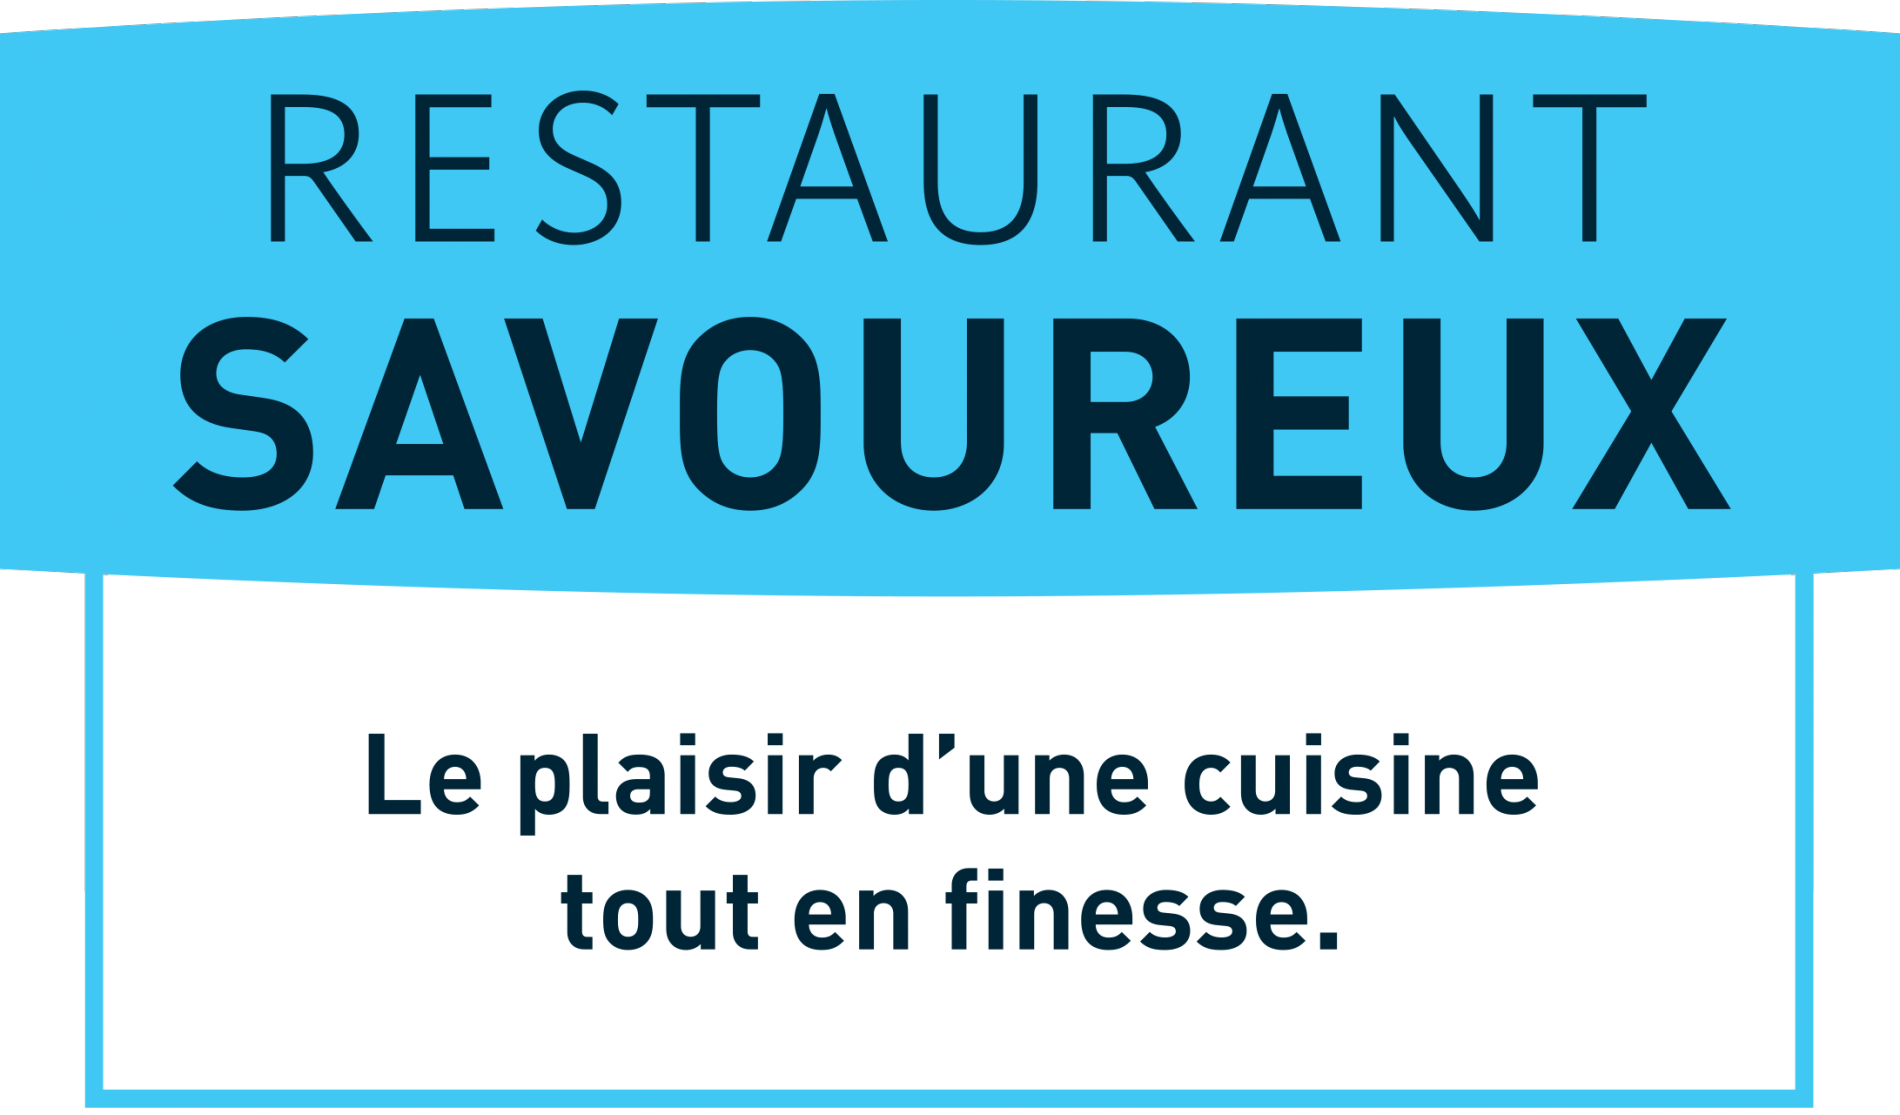 https://www.logishotels.com/fr/hotel/logis-hotel-le-cheval-blanc-7786